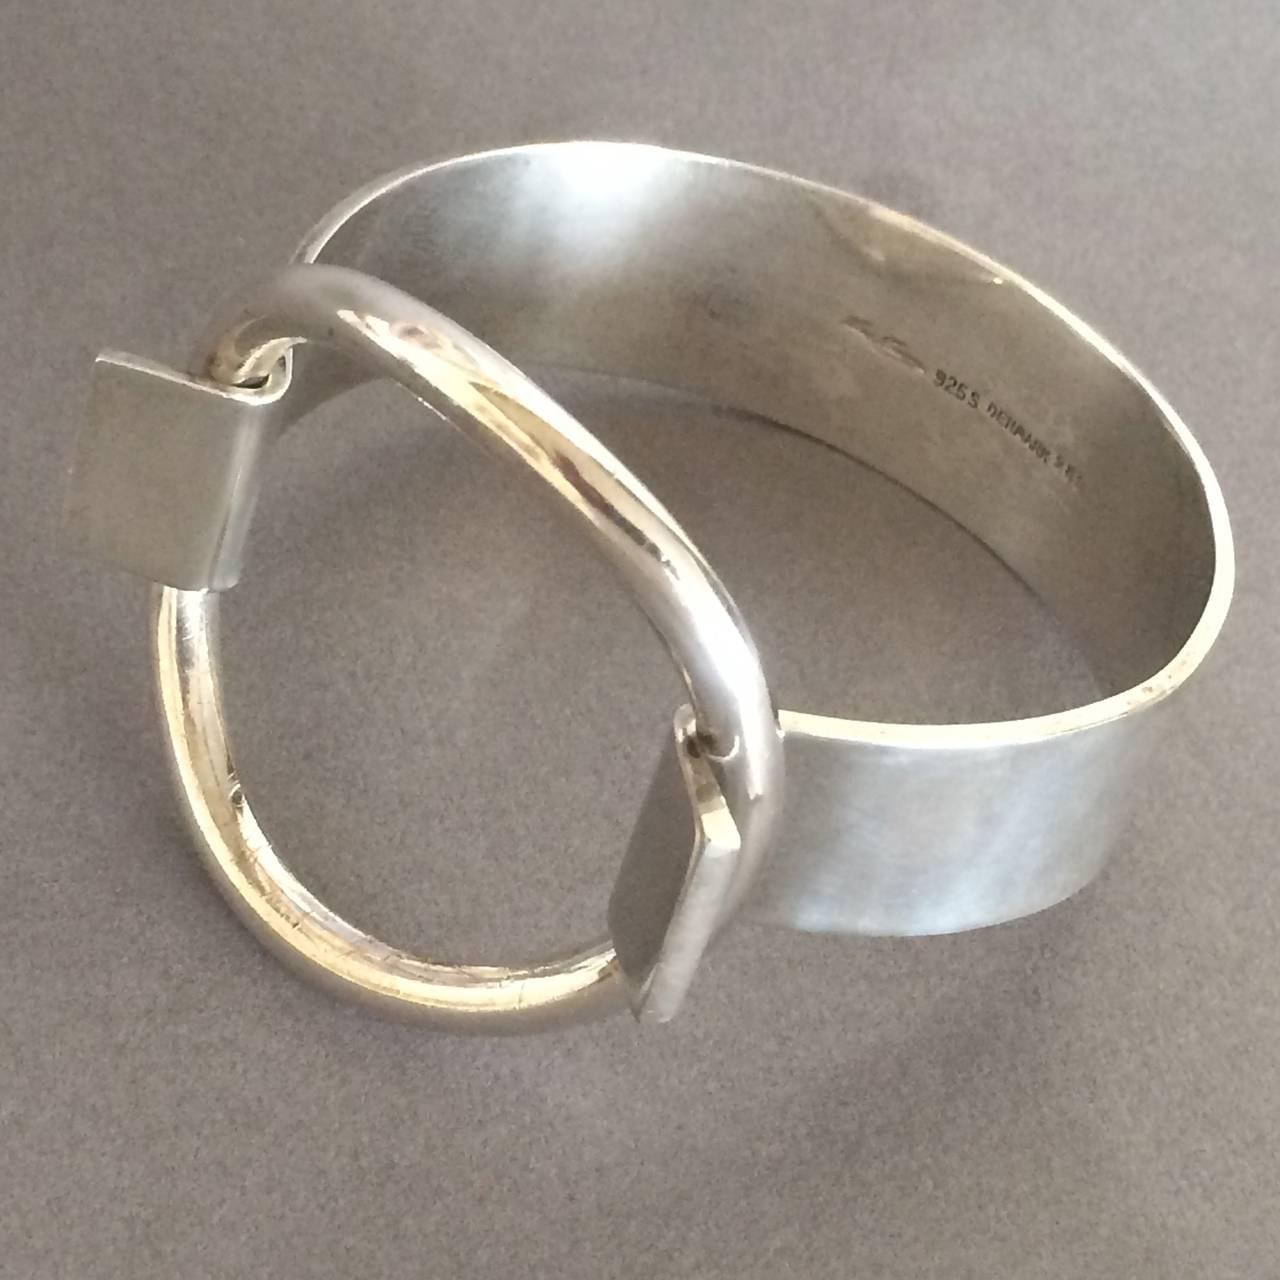 "Hans Hansen Modernist Cuff ""Ring"" Bracelet designed by Bent Gabrielsen 2"